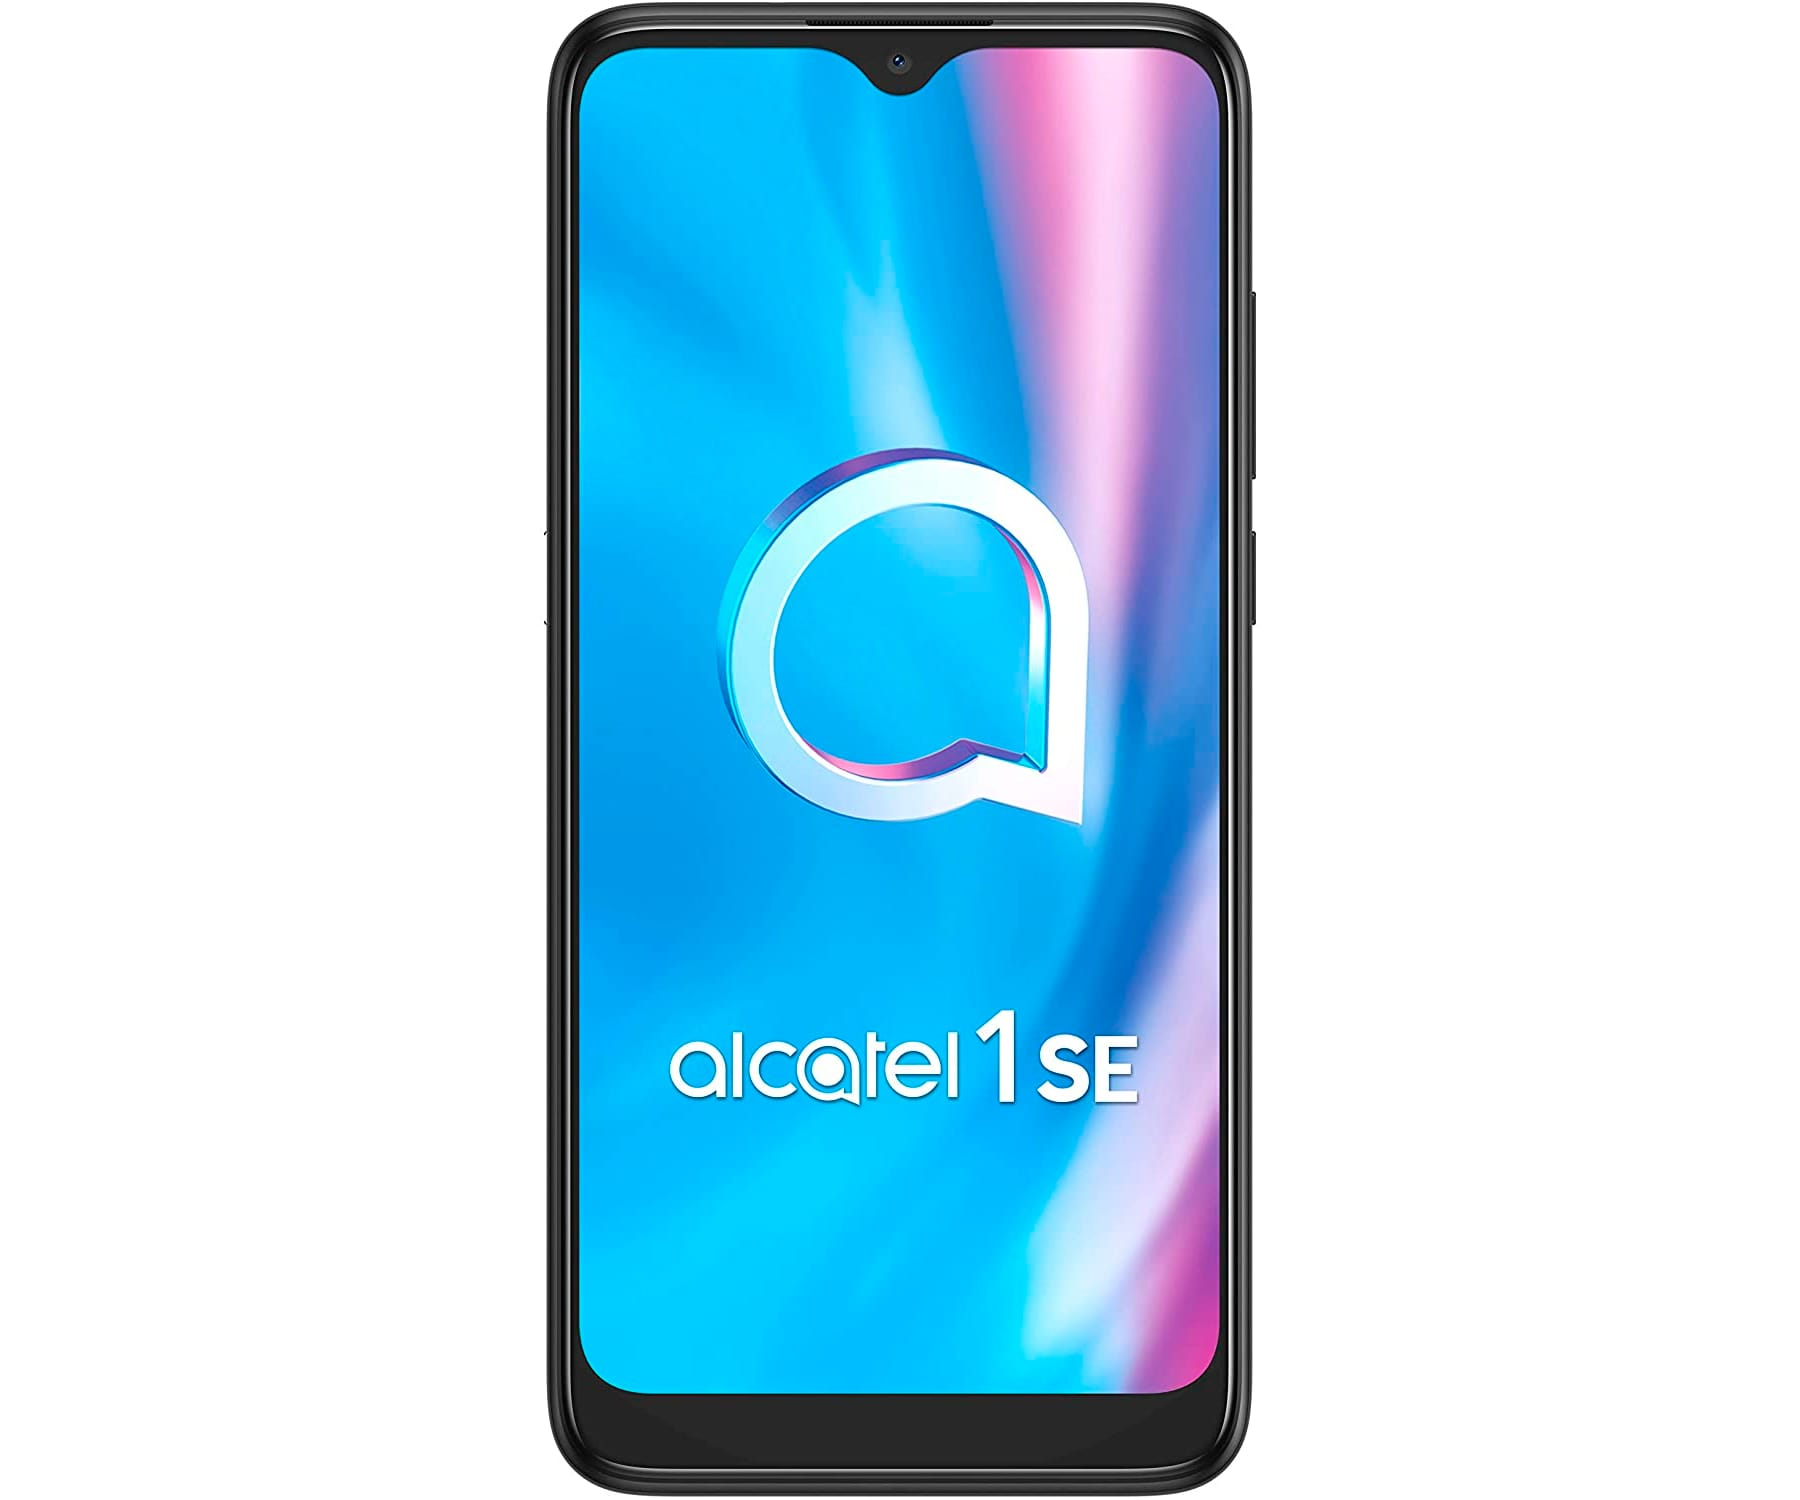 ALCATEL 1SE 5030D GRIS MÓVIL 4G DUAL SIM 6.22'' IPS HD+ OCTACORE 32GB 2GB RAM TRICAM 13MP SELFIES 5MP